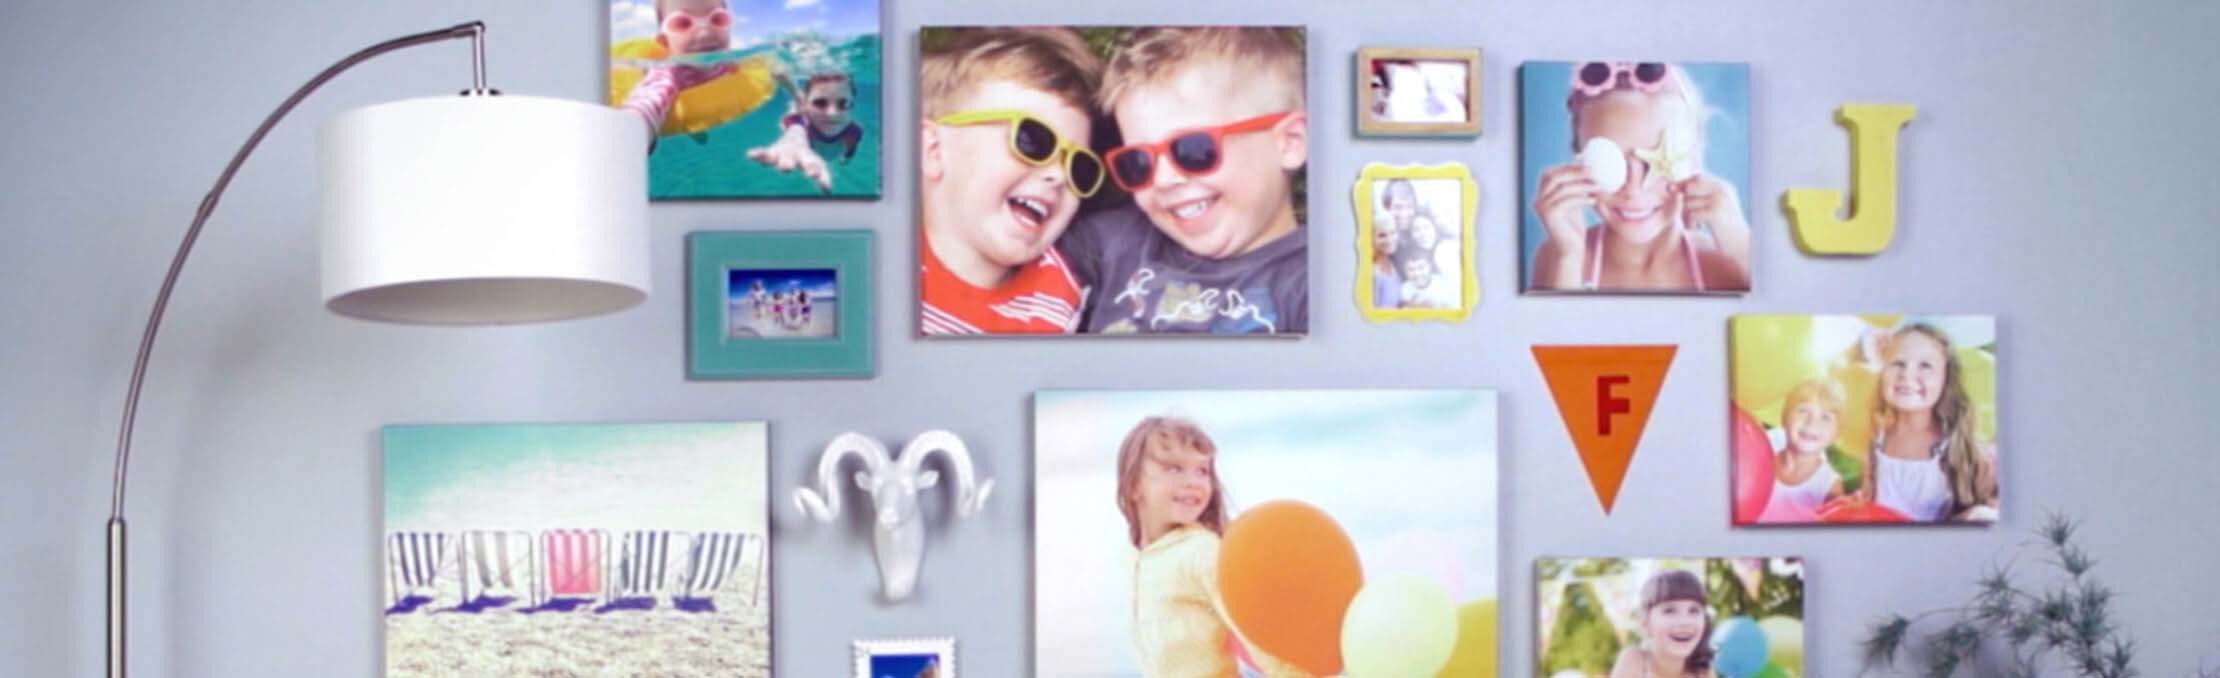 How To Create A Gallery Wall Walgreens Photo Blog Walgreens Photo